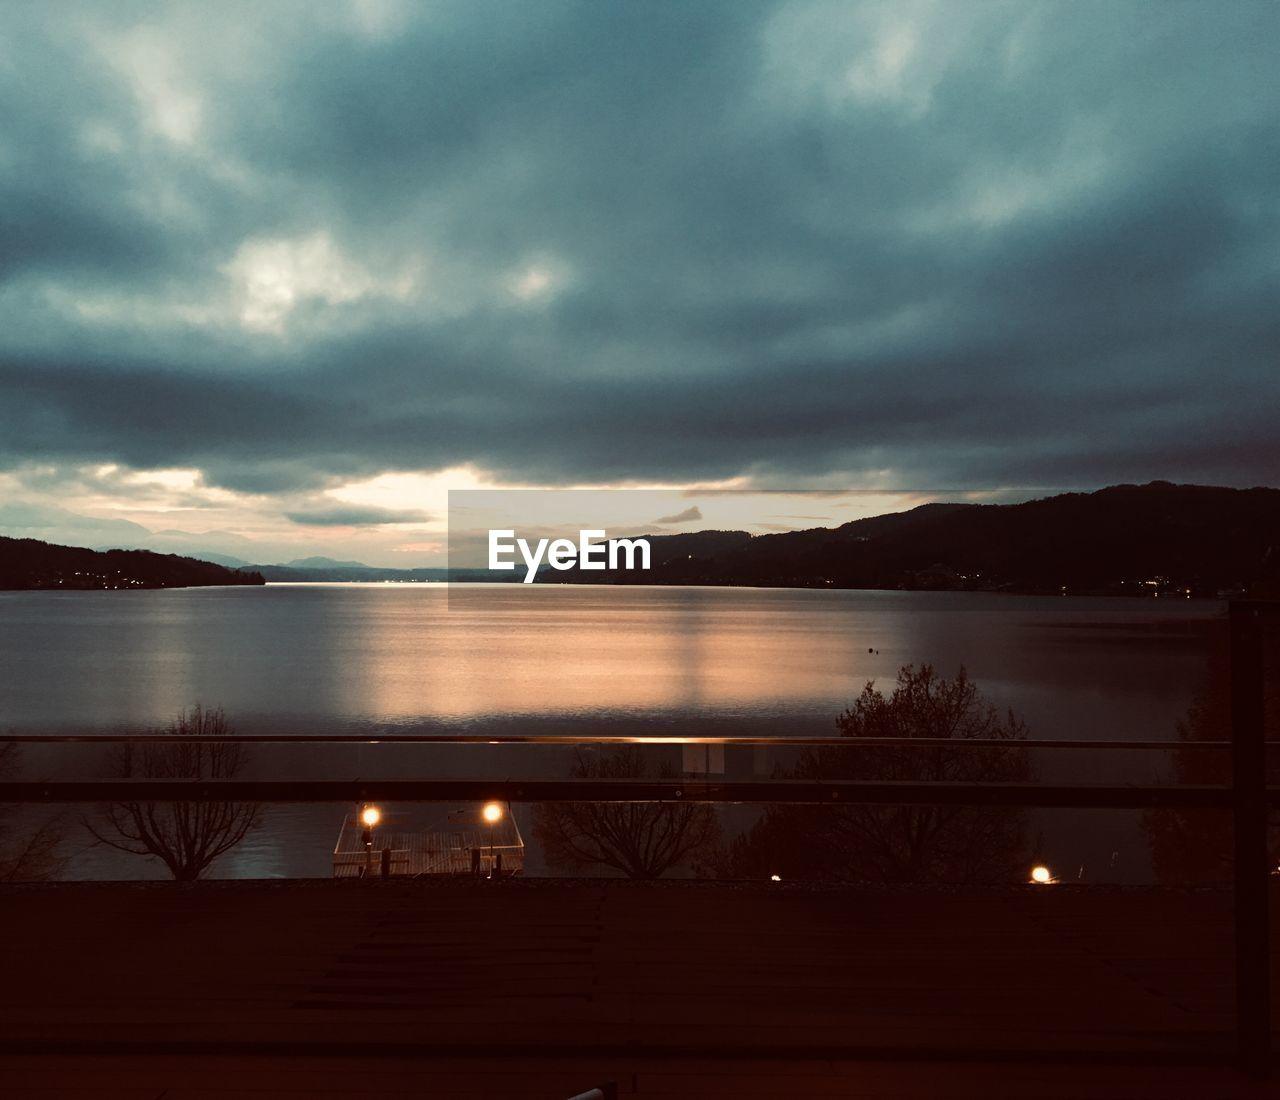 sky, water, cloud - sky, scenics - nature, beauty in nature, tranquil scene, tranquility, nature, no people, mountain, lake, reflection, overcast, illuminated, outdoors, dusk, idyllic